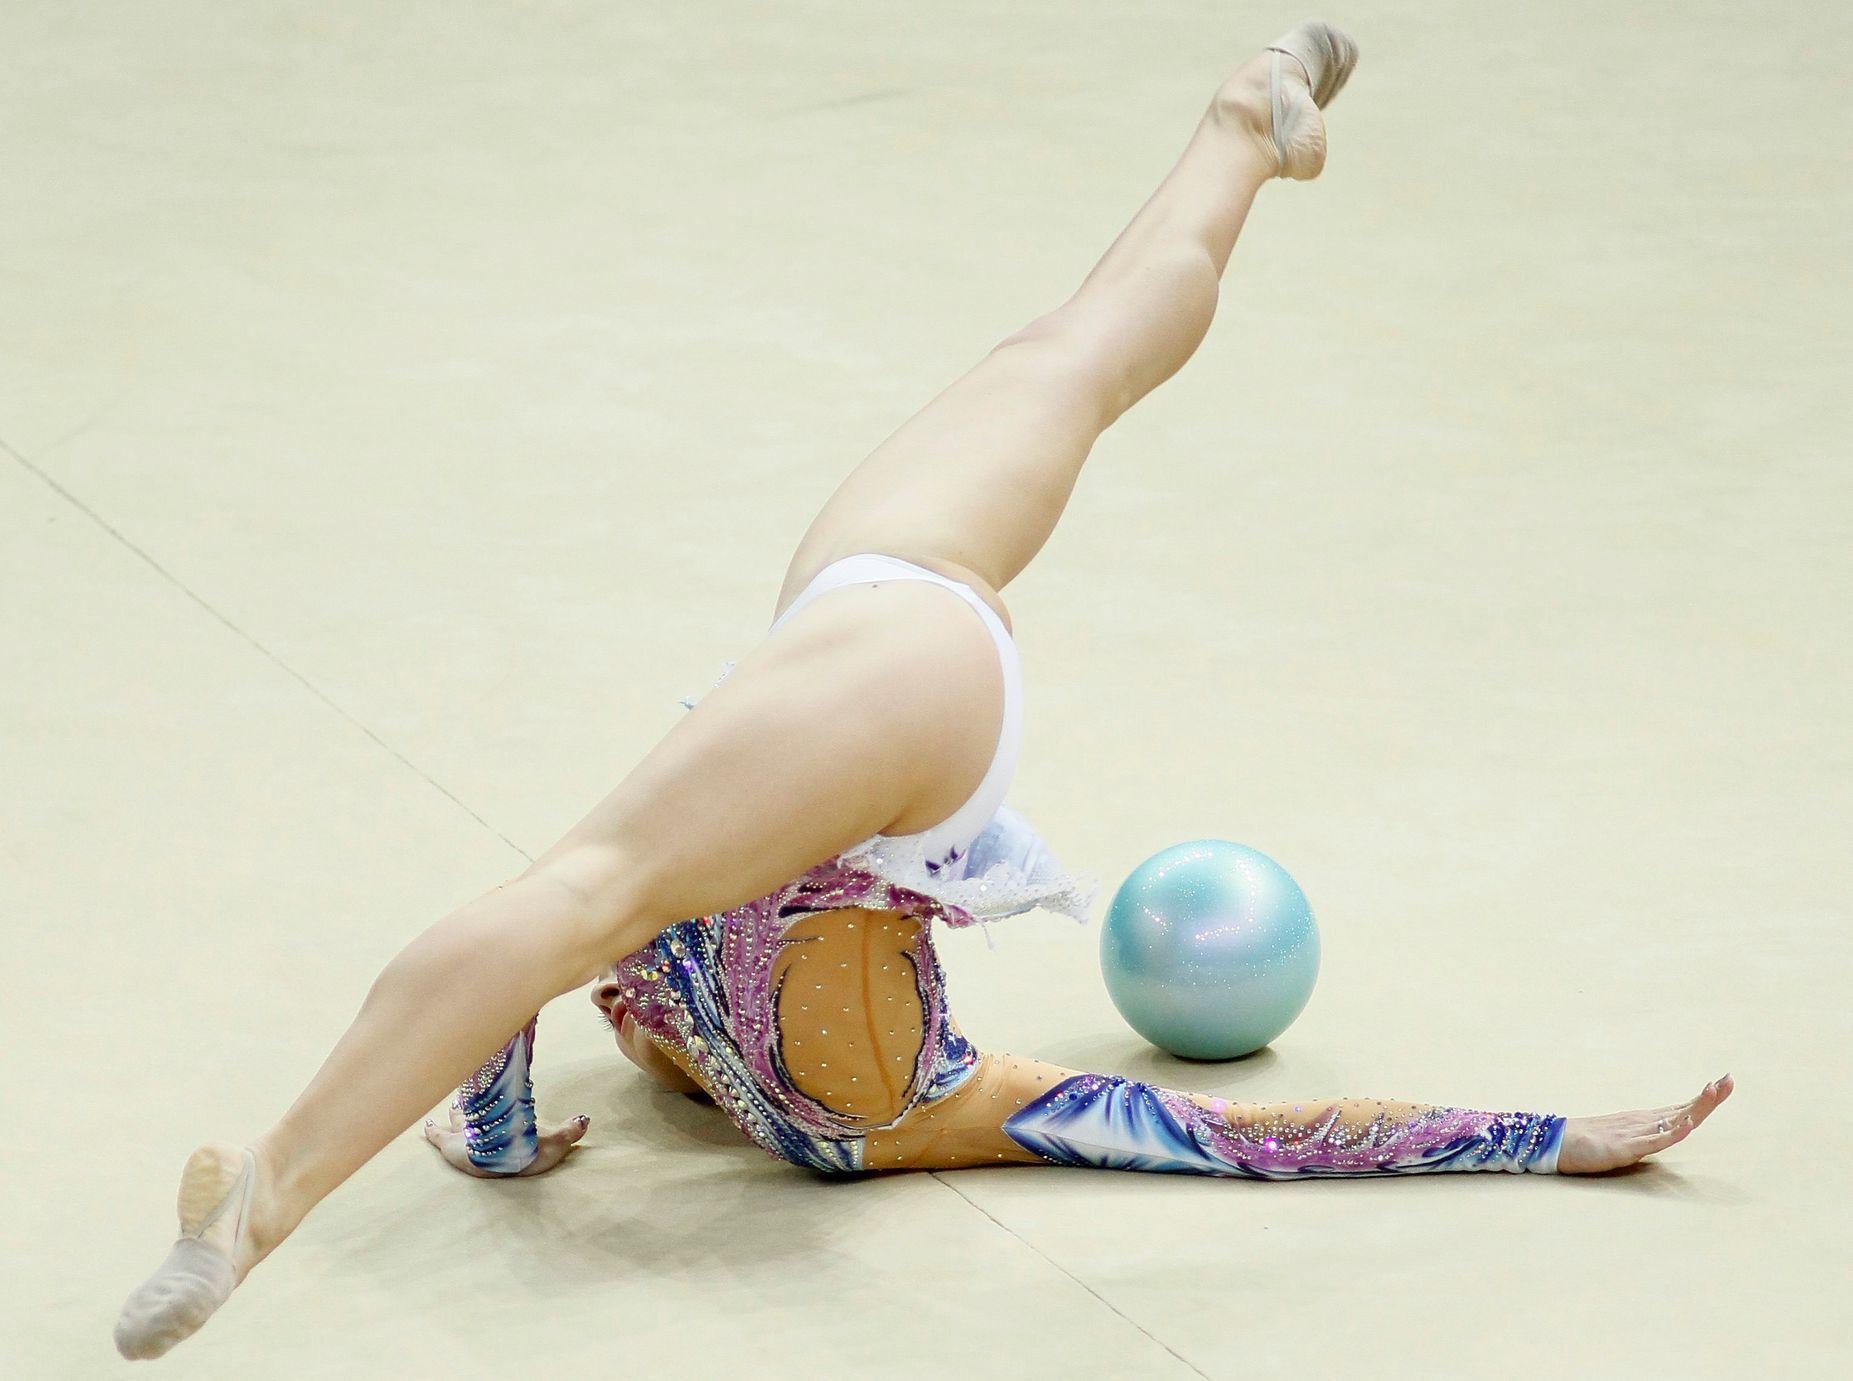 pikantnie-foto-molodih-gimnastok